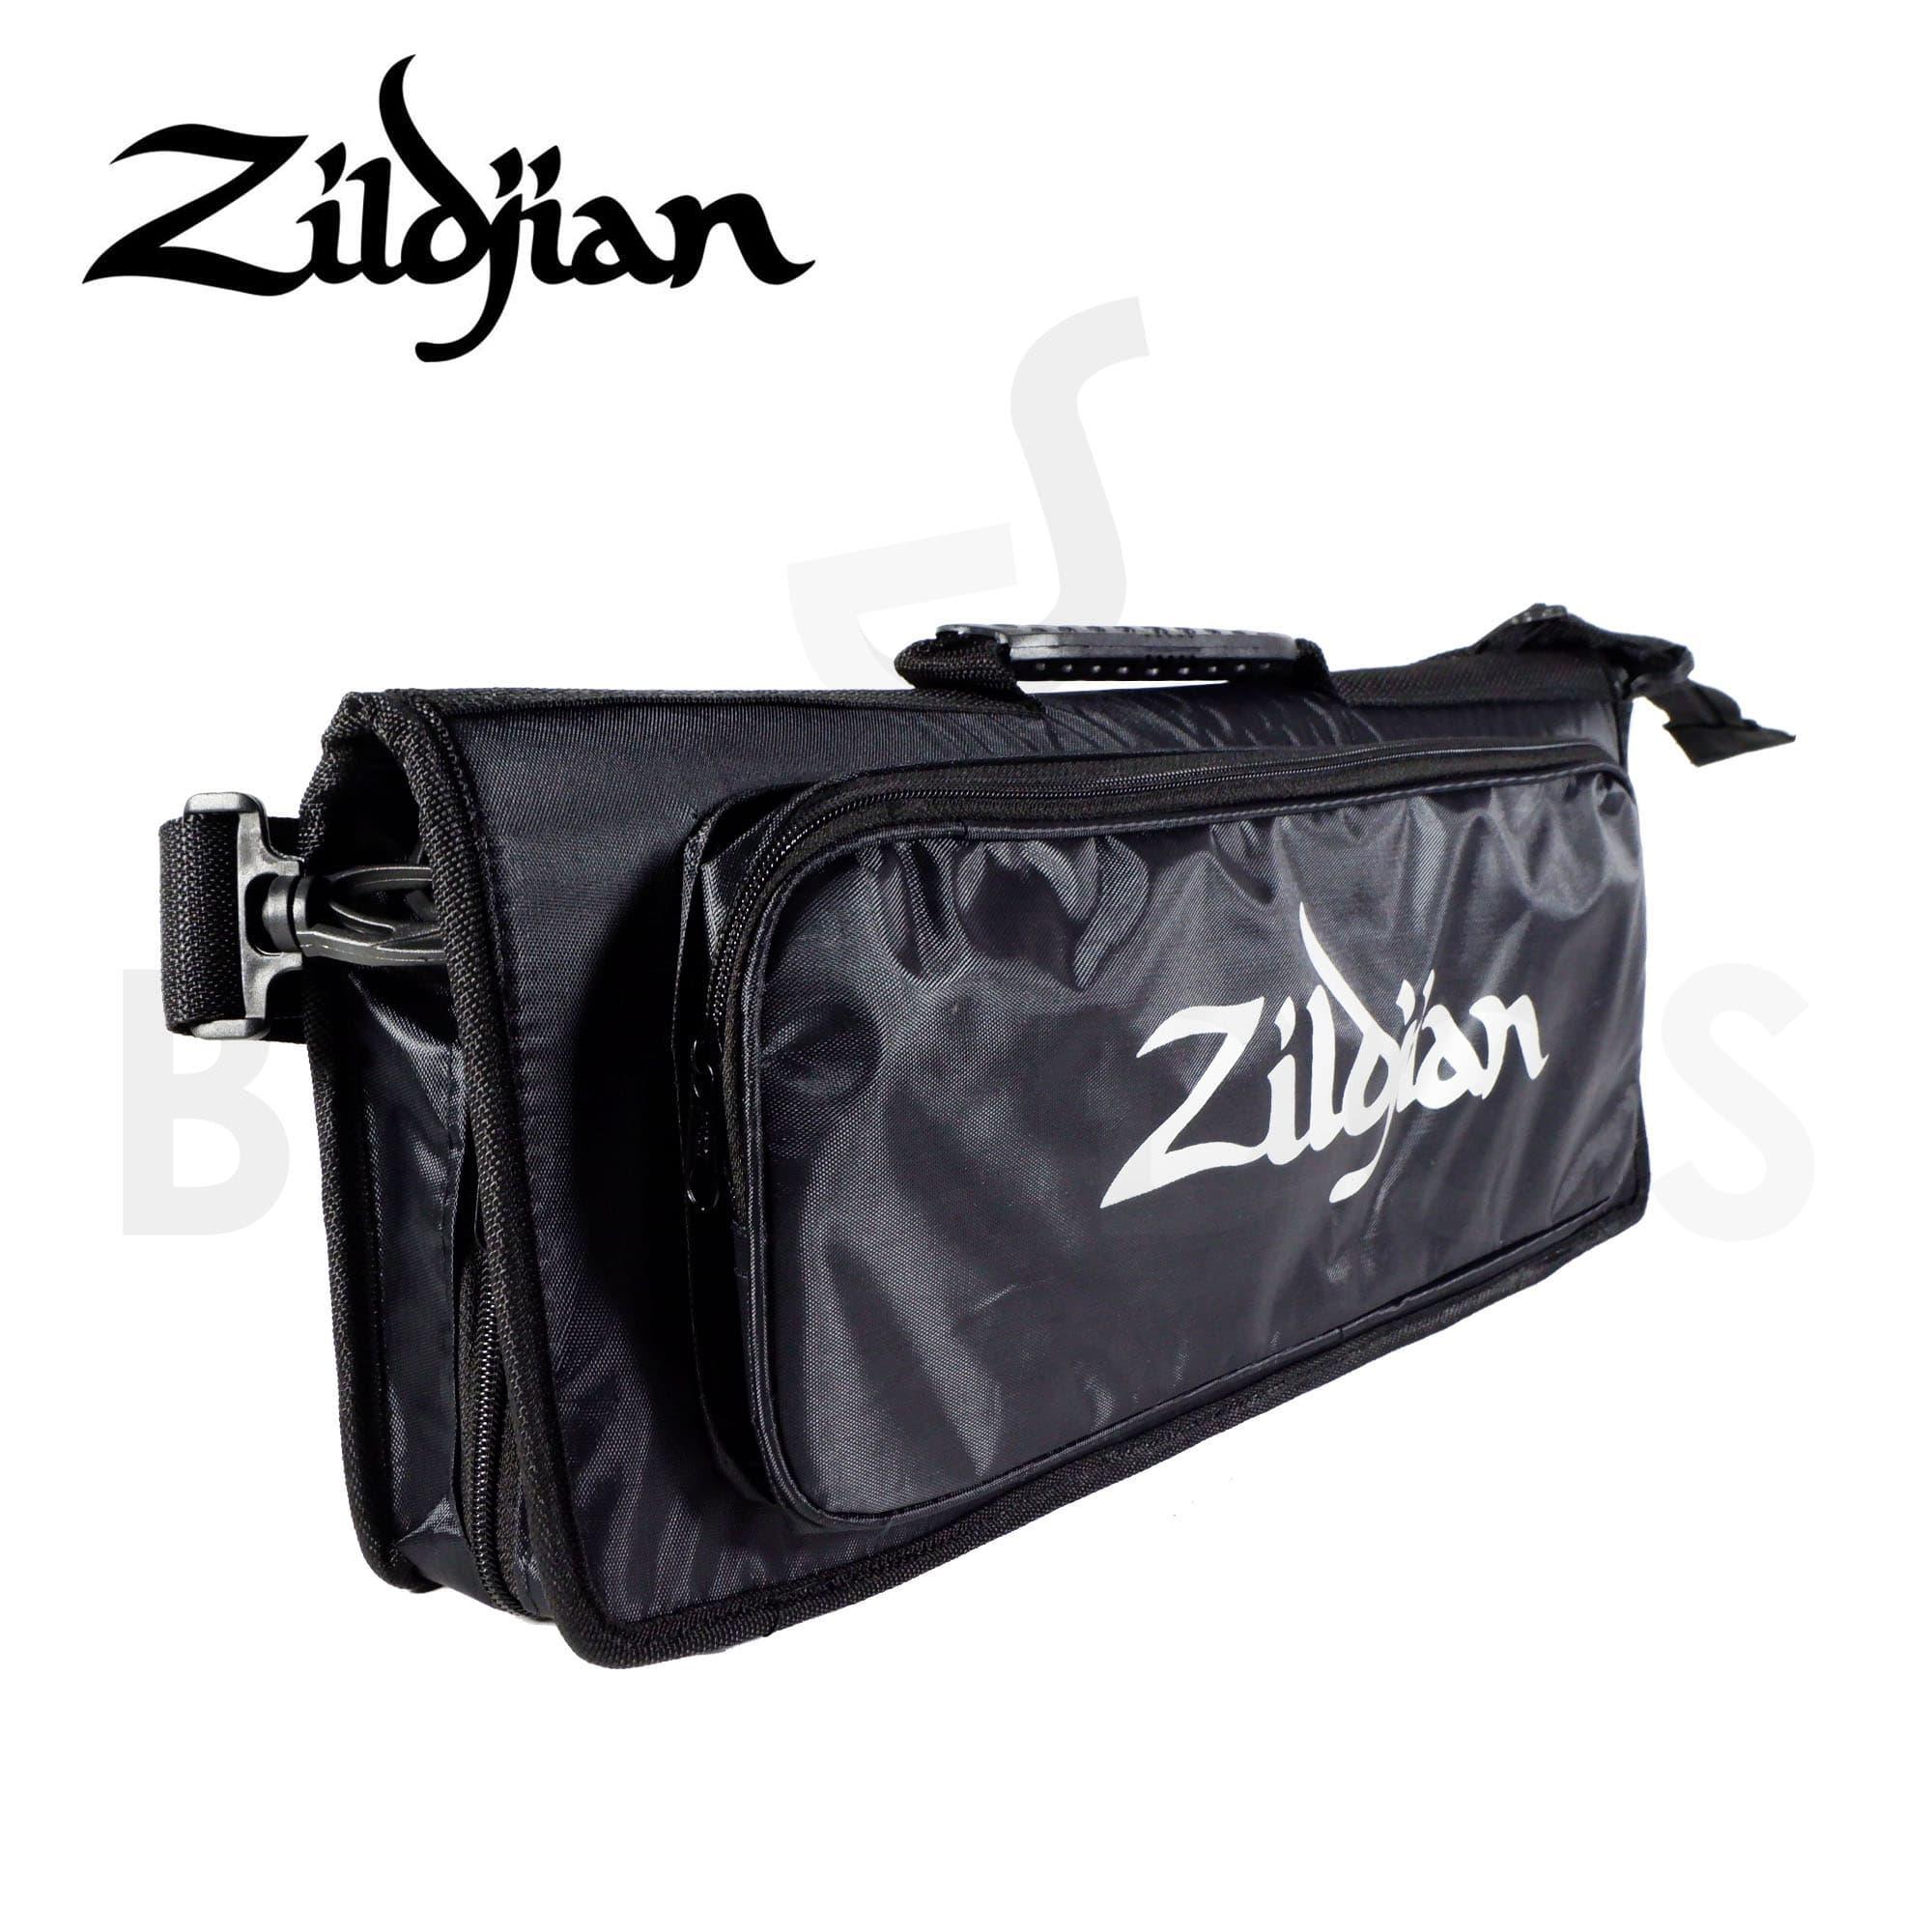 Jual Tas Softcase Stick Drum Zildjian Gigbag Scd 01 Stik Wanita Etnik By Suhendar